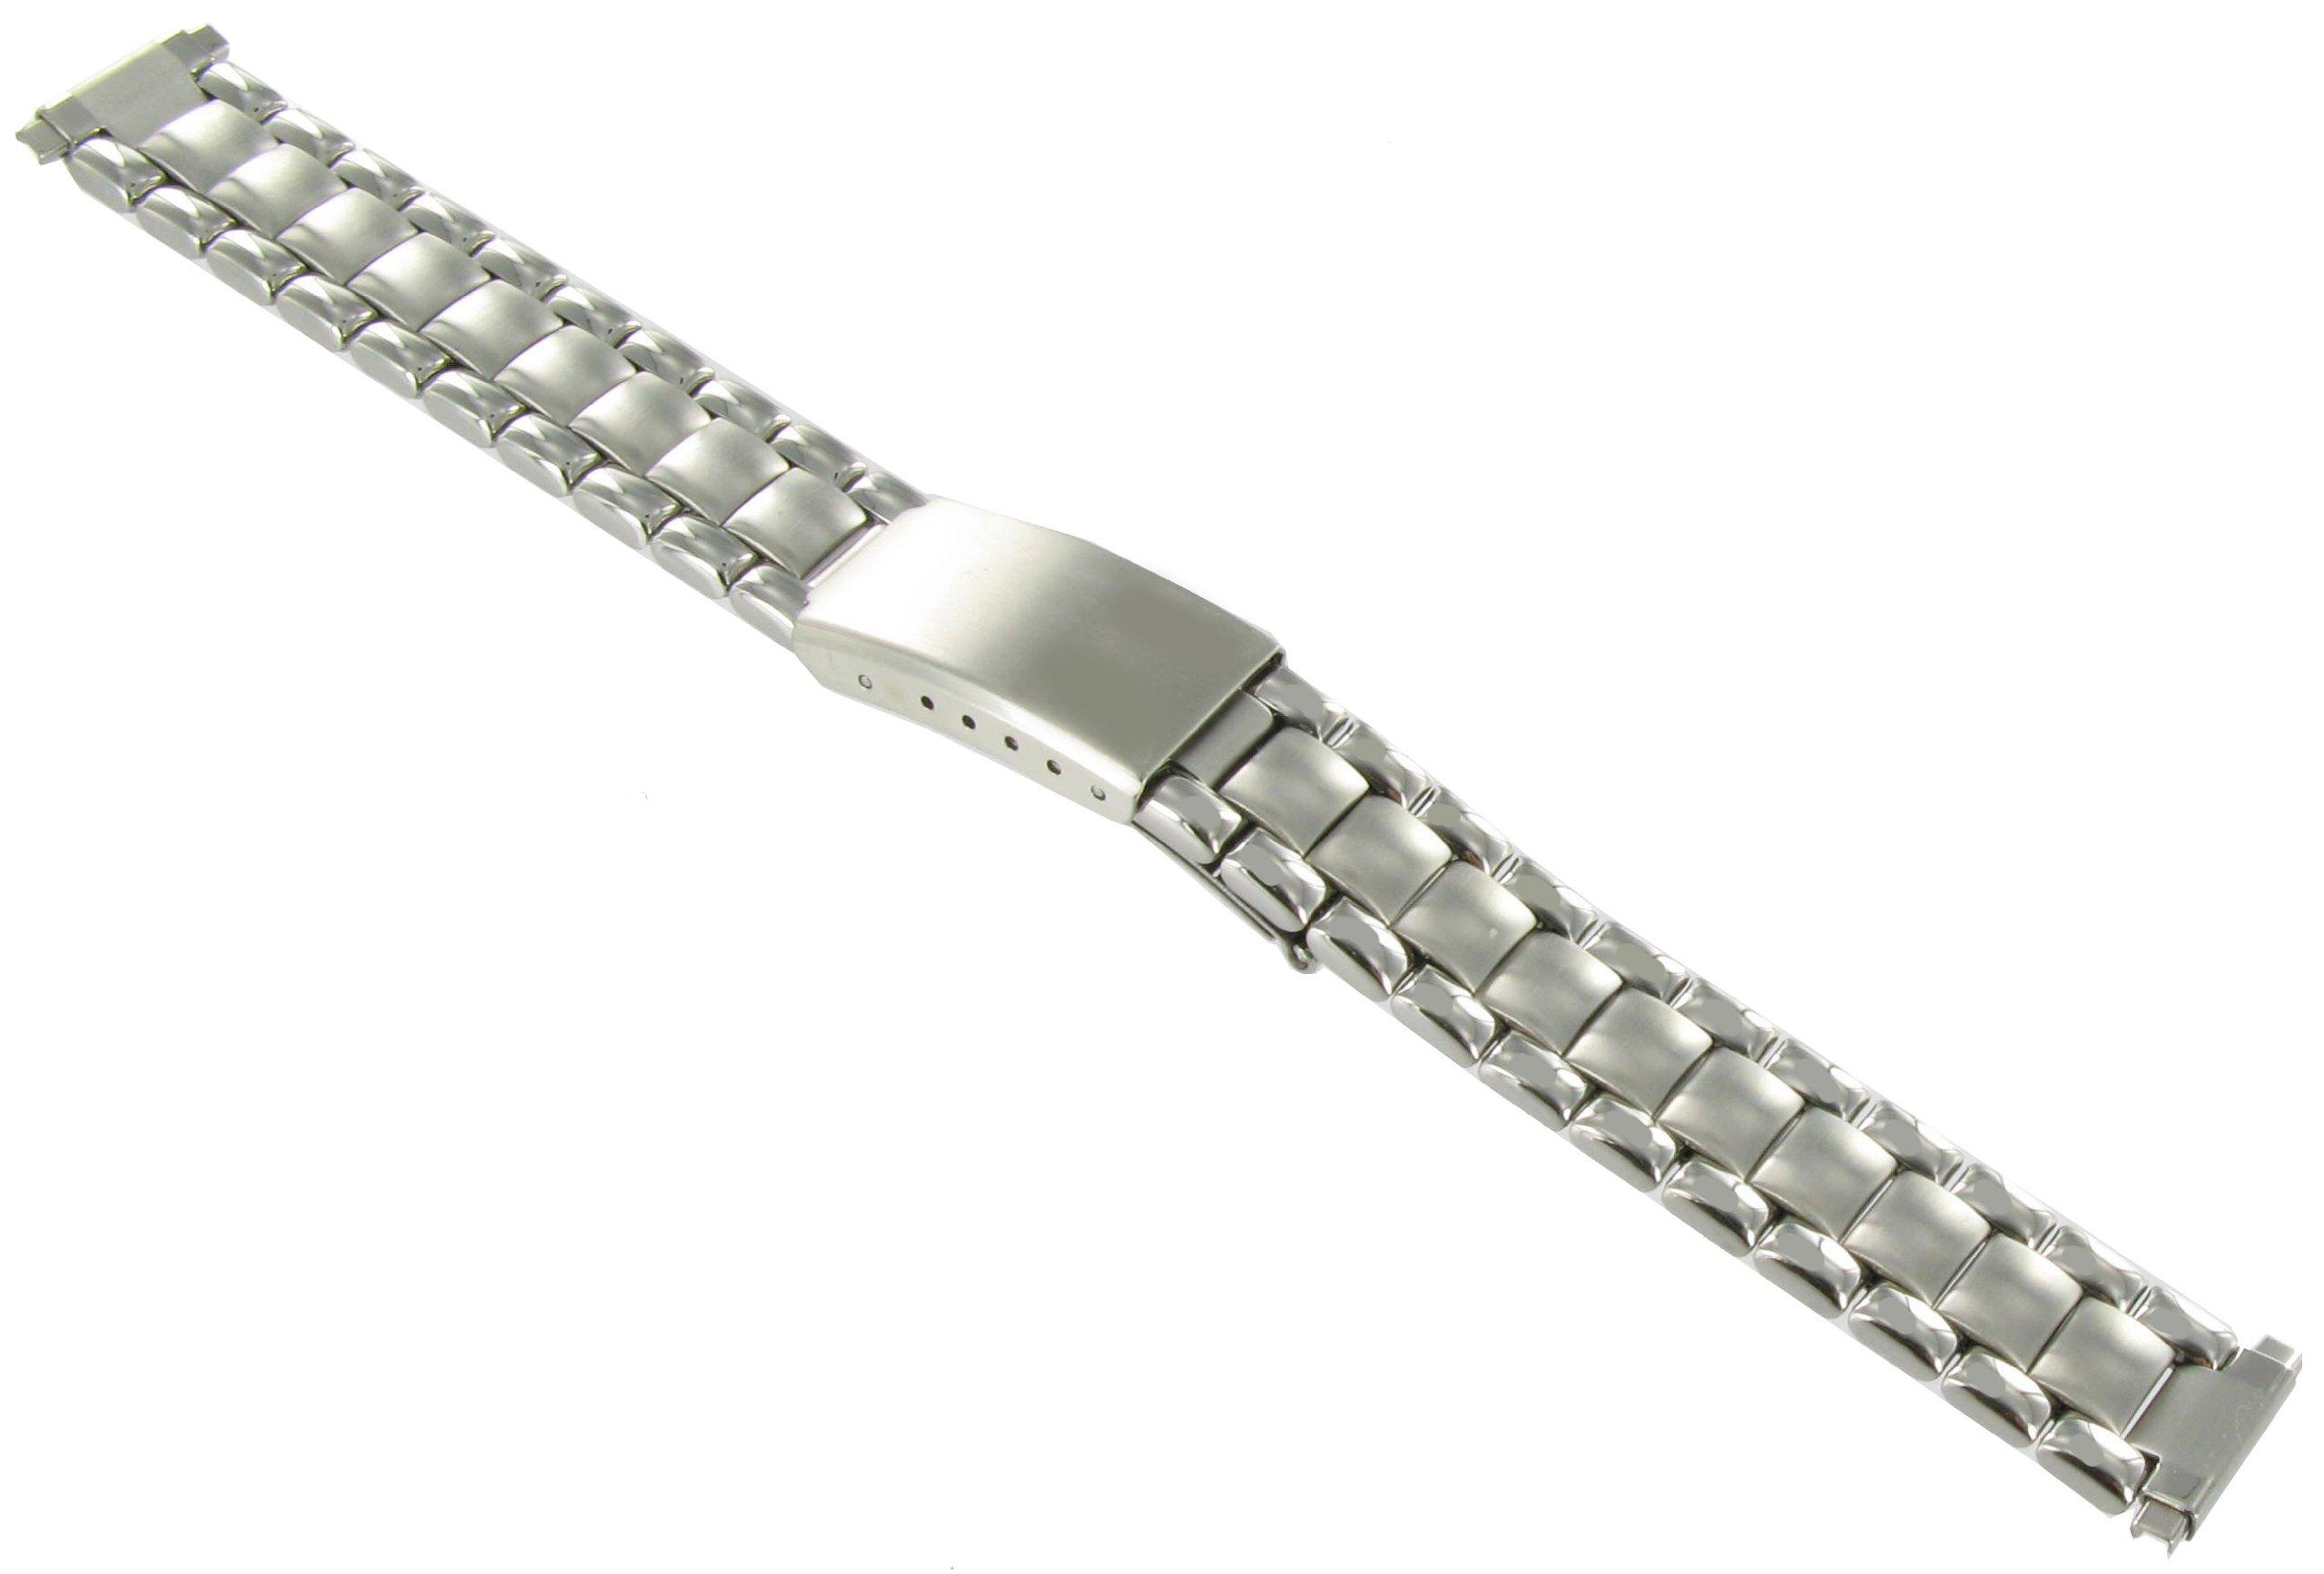 12-16mm Speidel Silver Tone Adjustable Semi-Solid Link Deployment Buckle Watch Band 1829/00